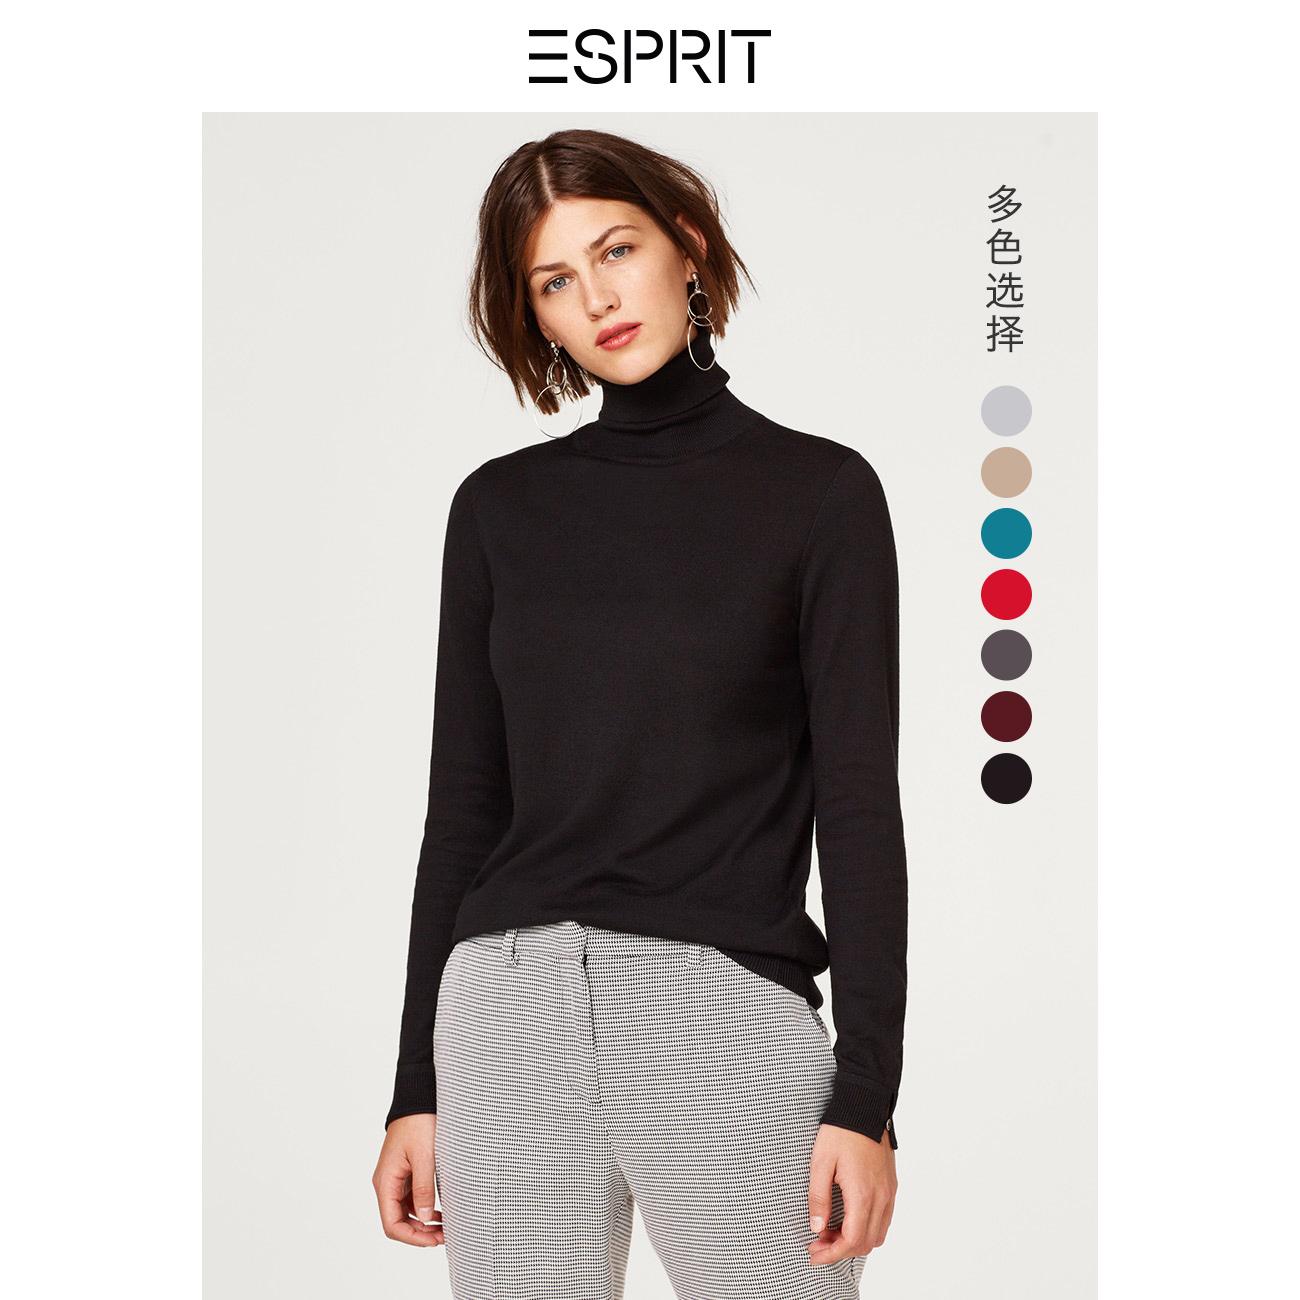 ESPRIT EDC女装秋冬新款高领休闲纯色套头针织衫长袖-098CC1I002